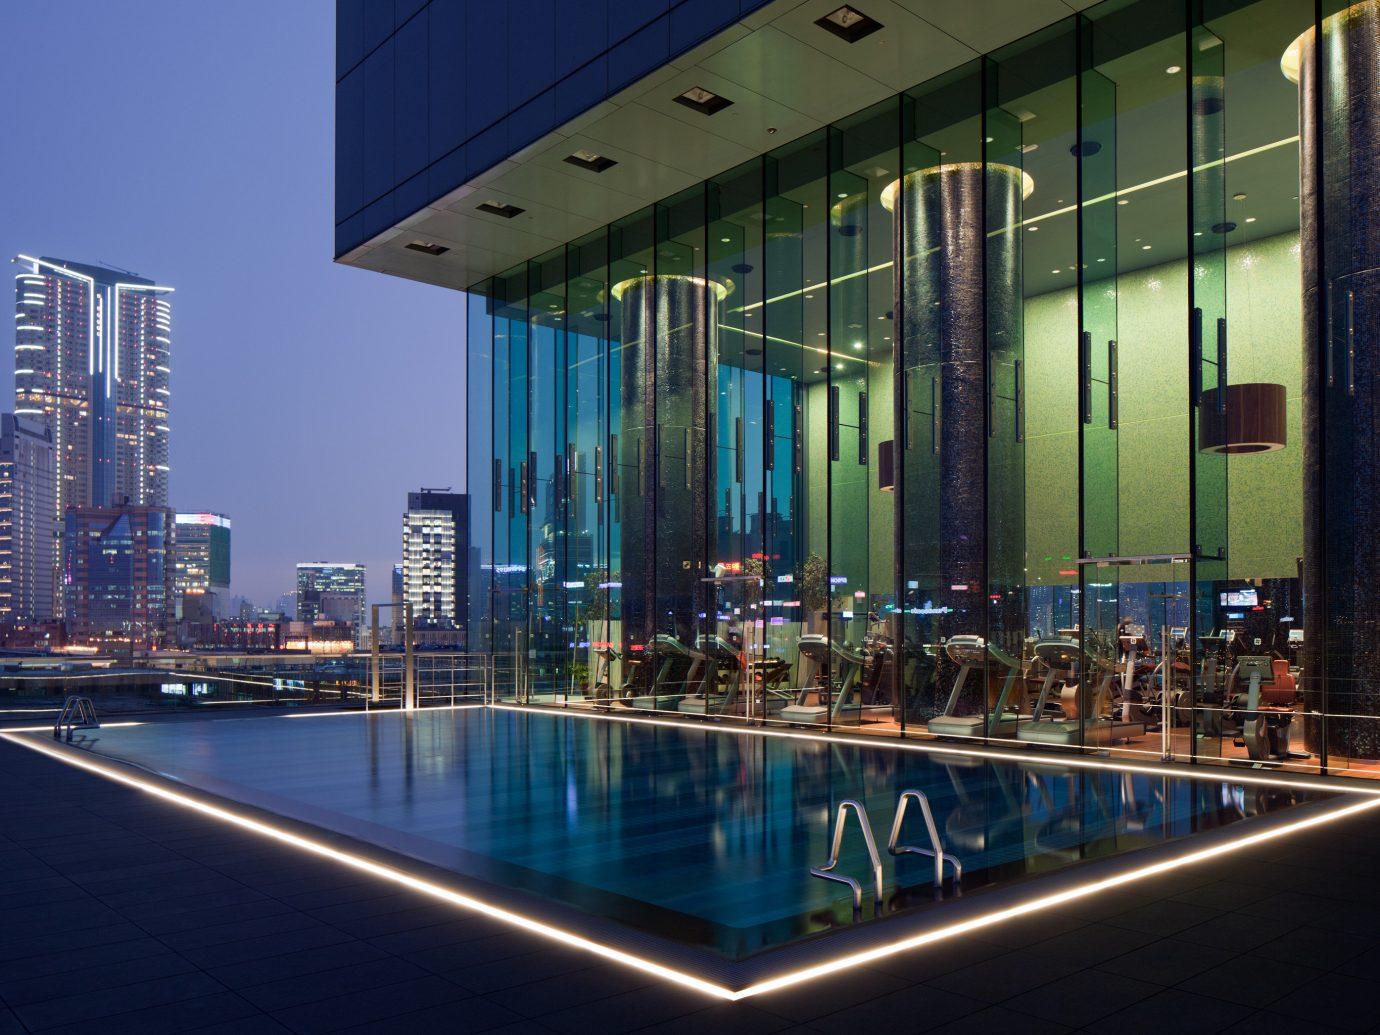 Hotels building outdoor Architecture night condominium lighting convention center reflection headquarters City skyscraper